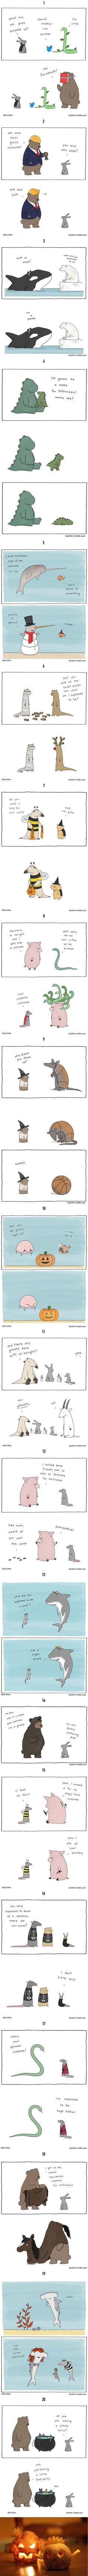 Animals Celebrating Halloween (Halloween Kostm)   www.FactToss.com